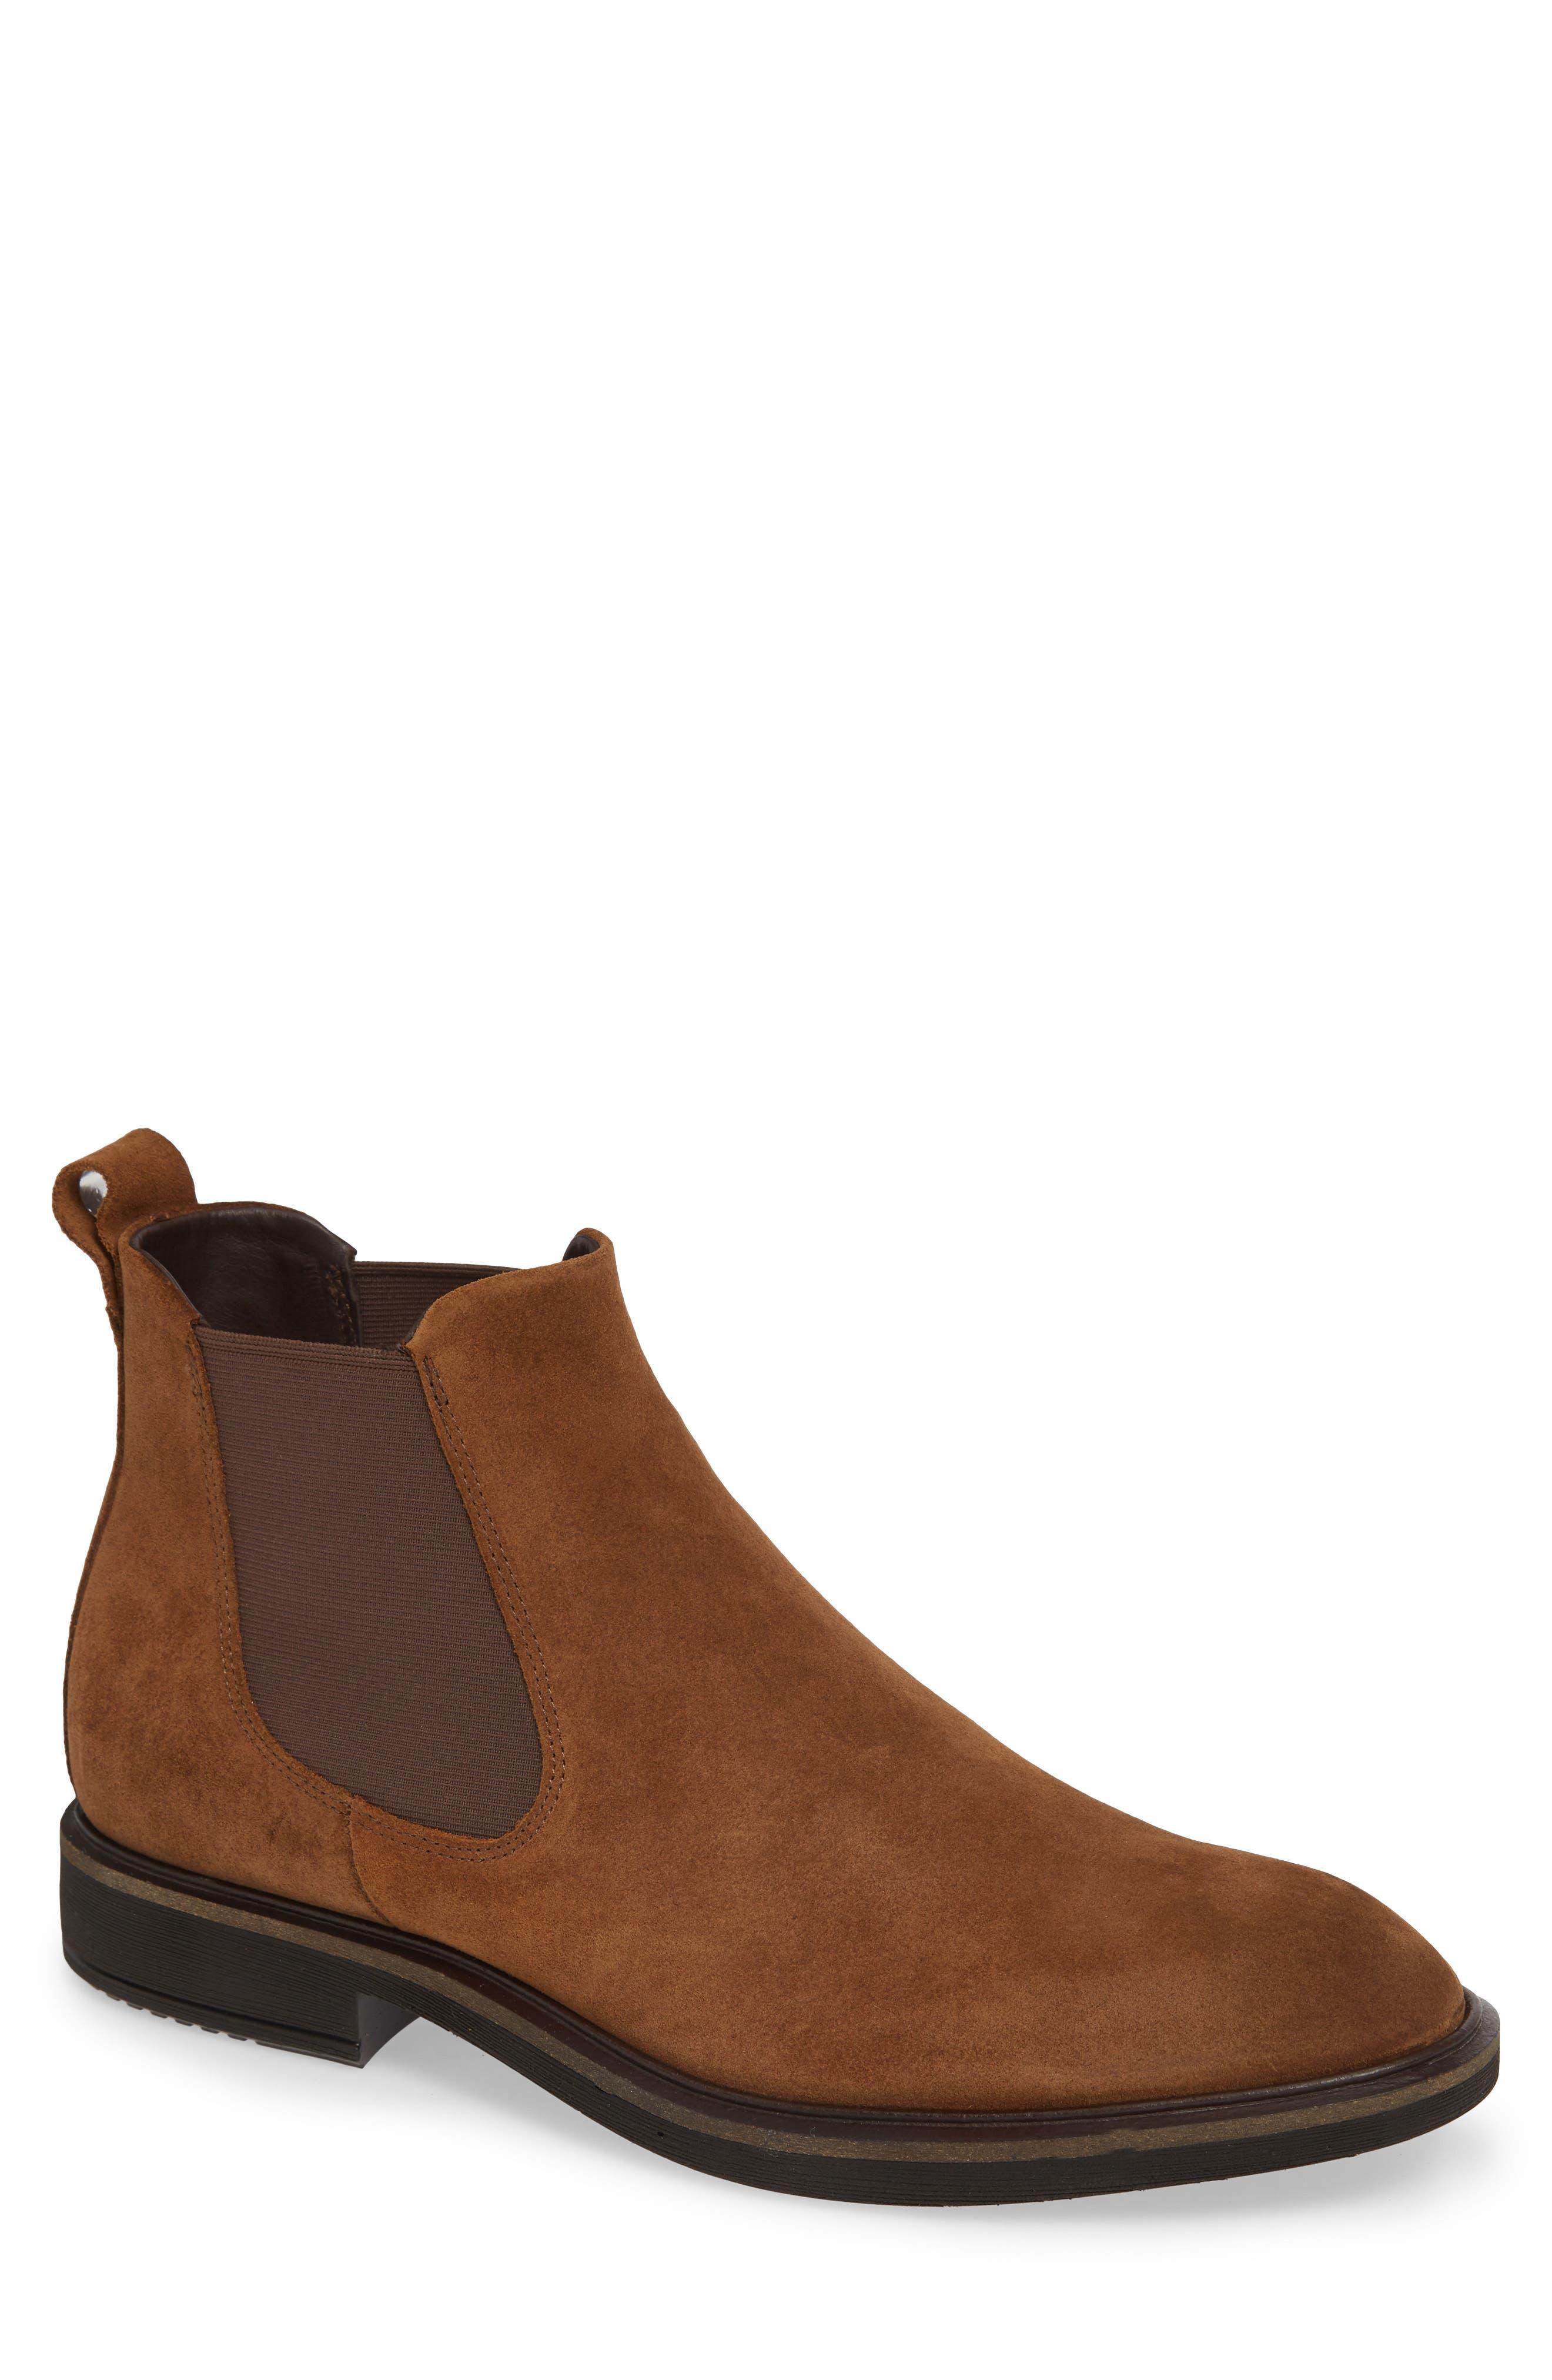 Vitrus II Chelsea Boot,                         Main,                         color, BISON